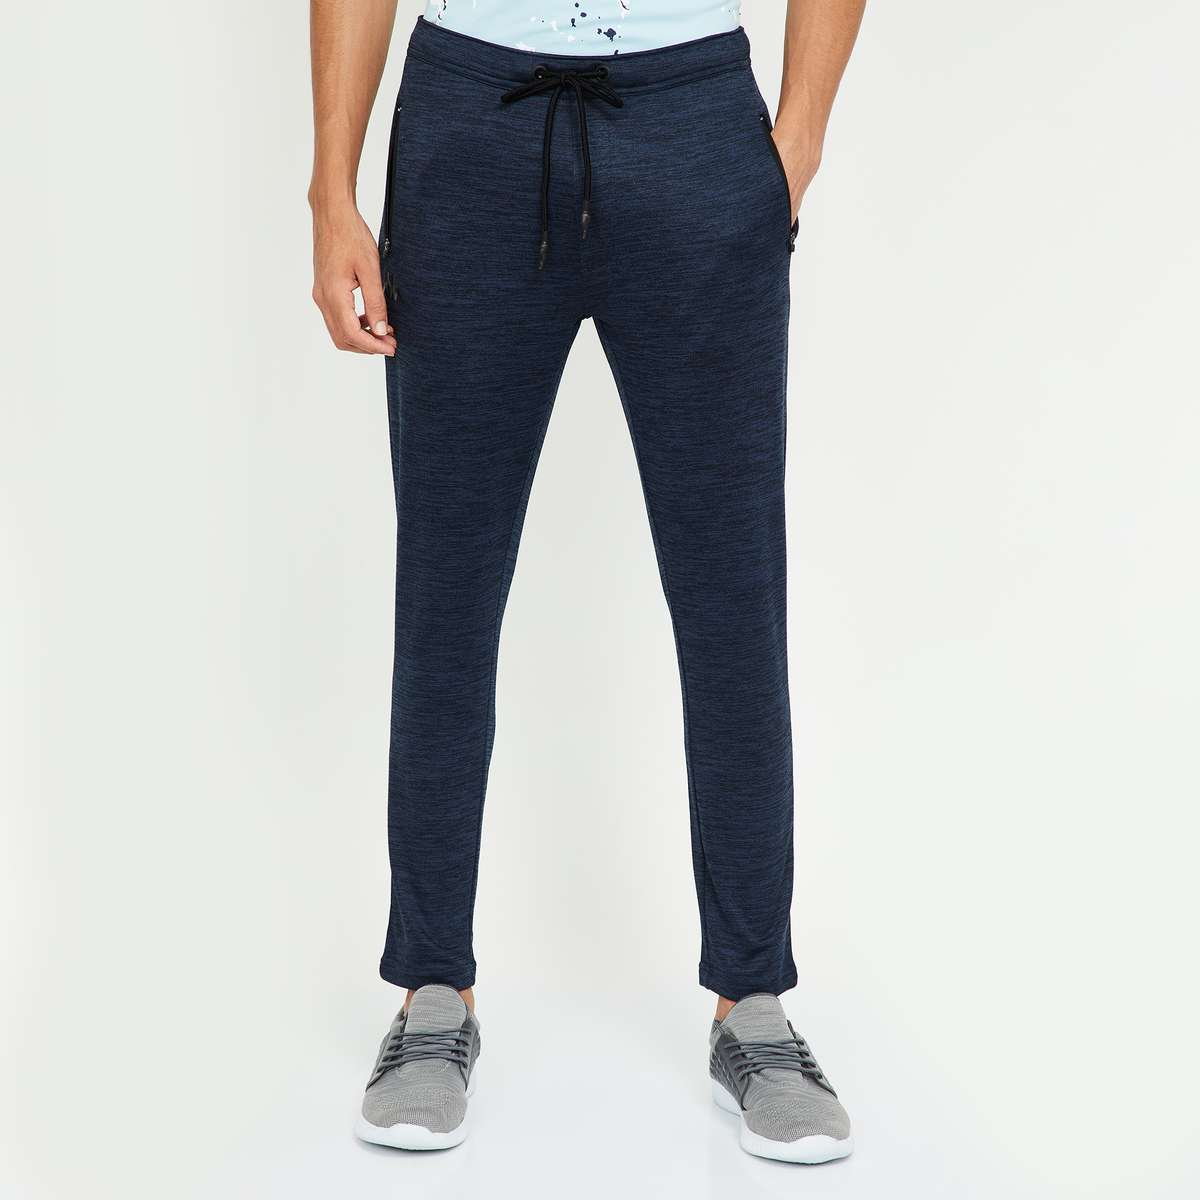 3.KAPPA Solid Slim Fit Track Pants